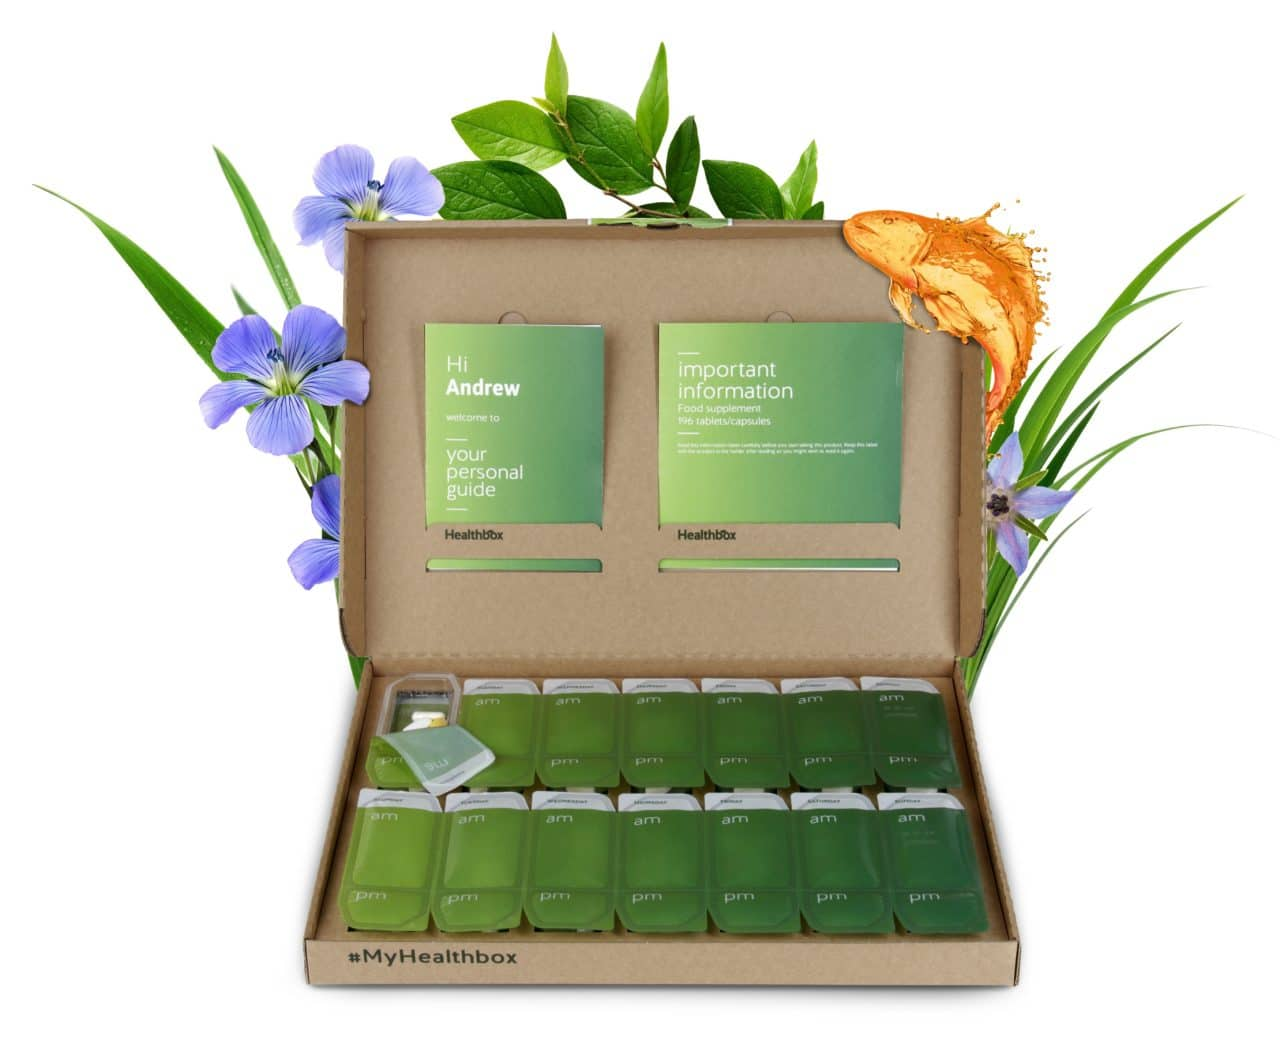 H&B launches bespoke 'vitamin box' service - www